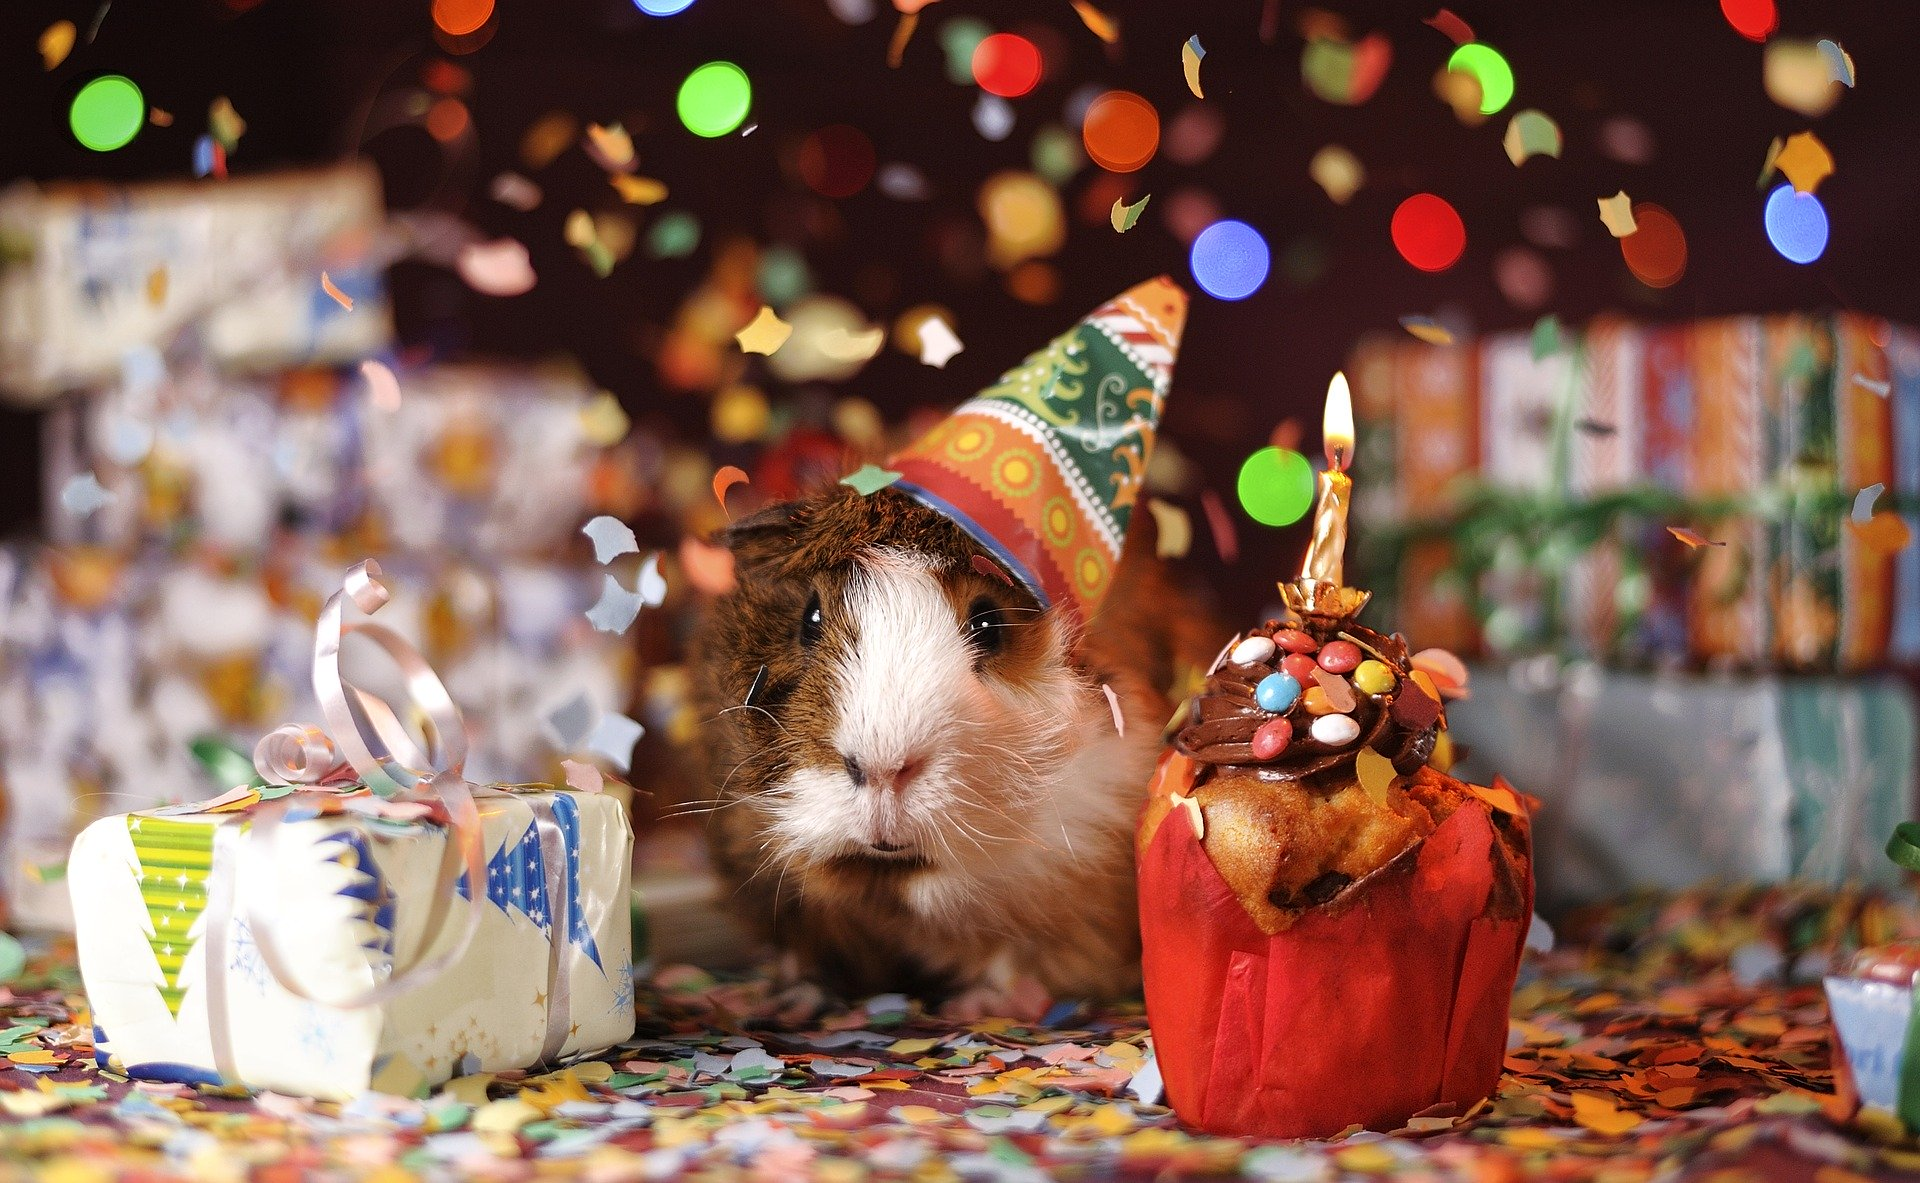 Wish A Happy Birthday To Someone Celebrating Their Birthday During The Coronavirus Shutdown Bicester Advertiser